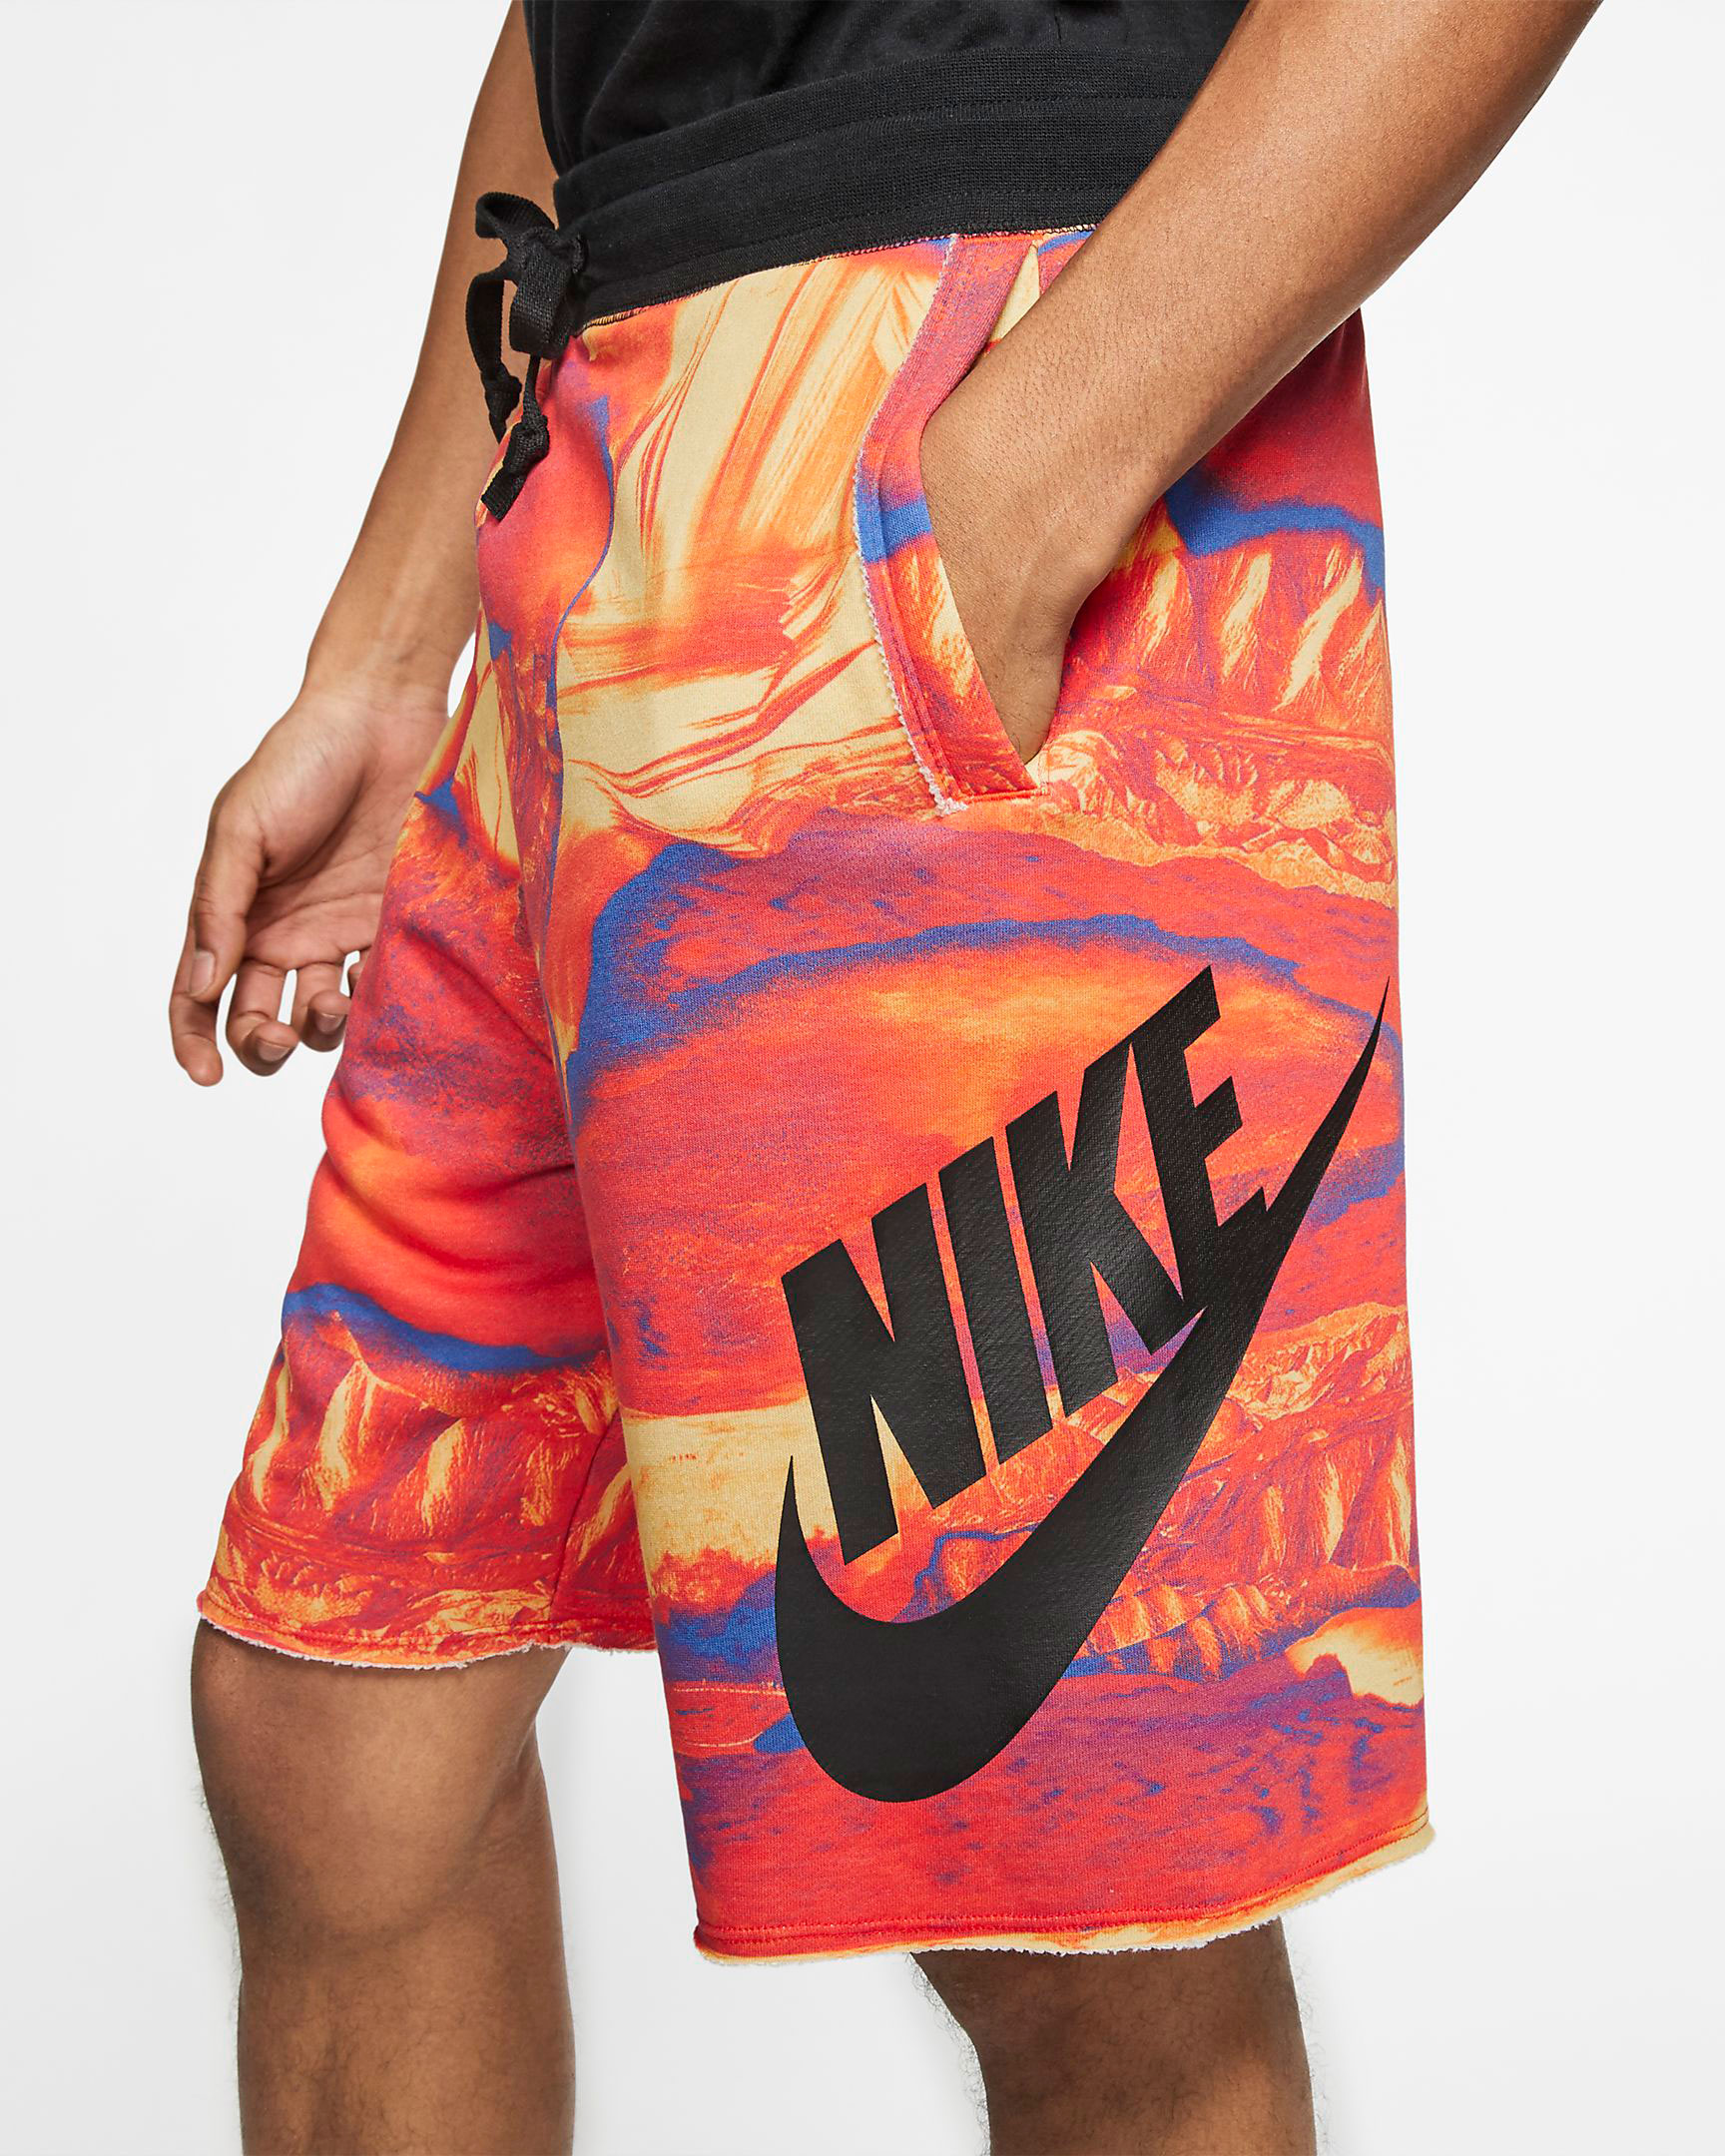 nike-organic-distortion-shorts-2